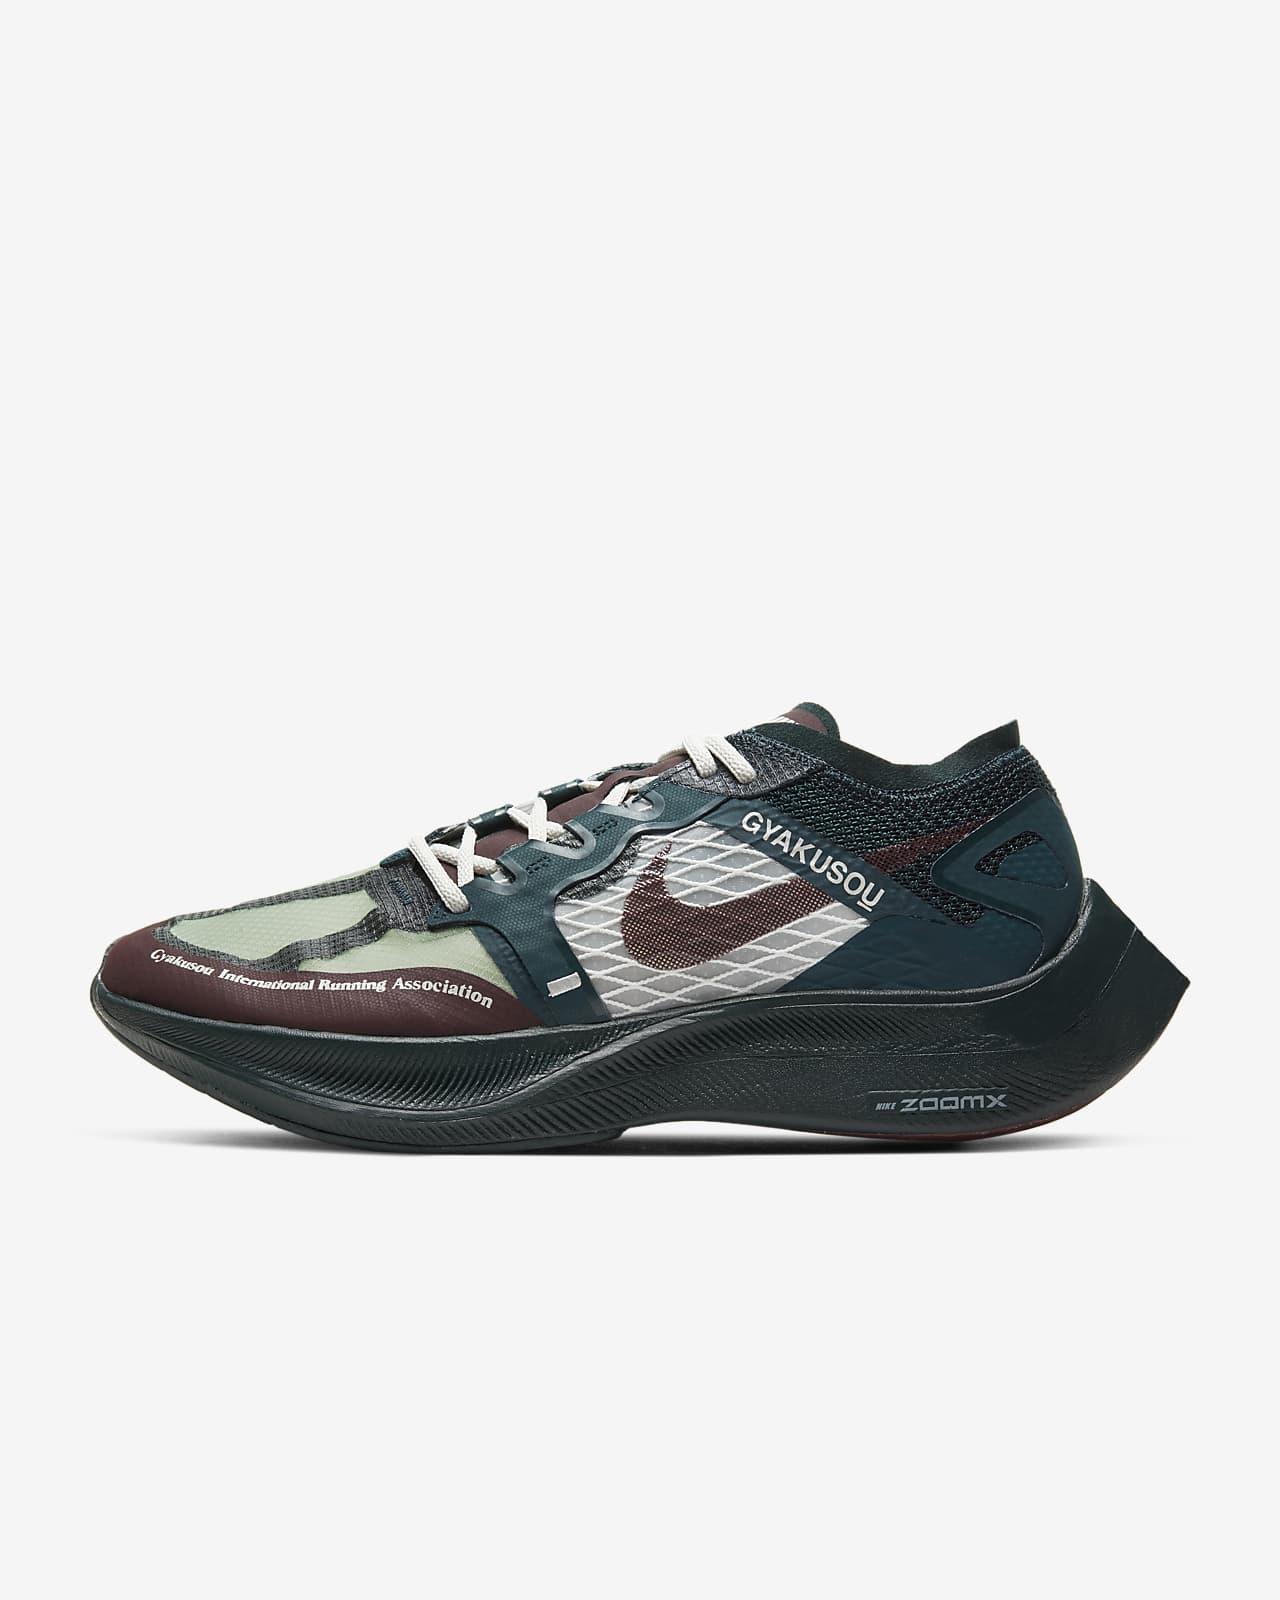 Nike ZoomX Vaporfly Next% x Gyakusou Koşu Ayakkabısı